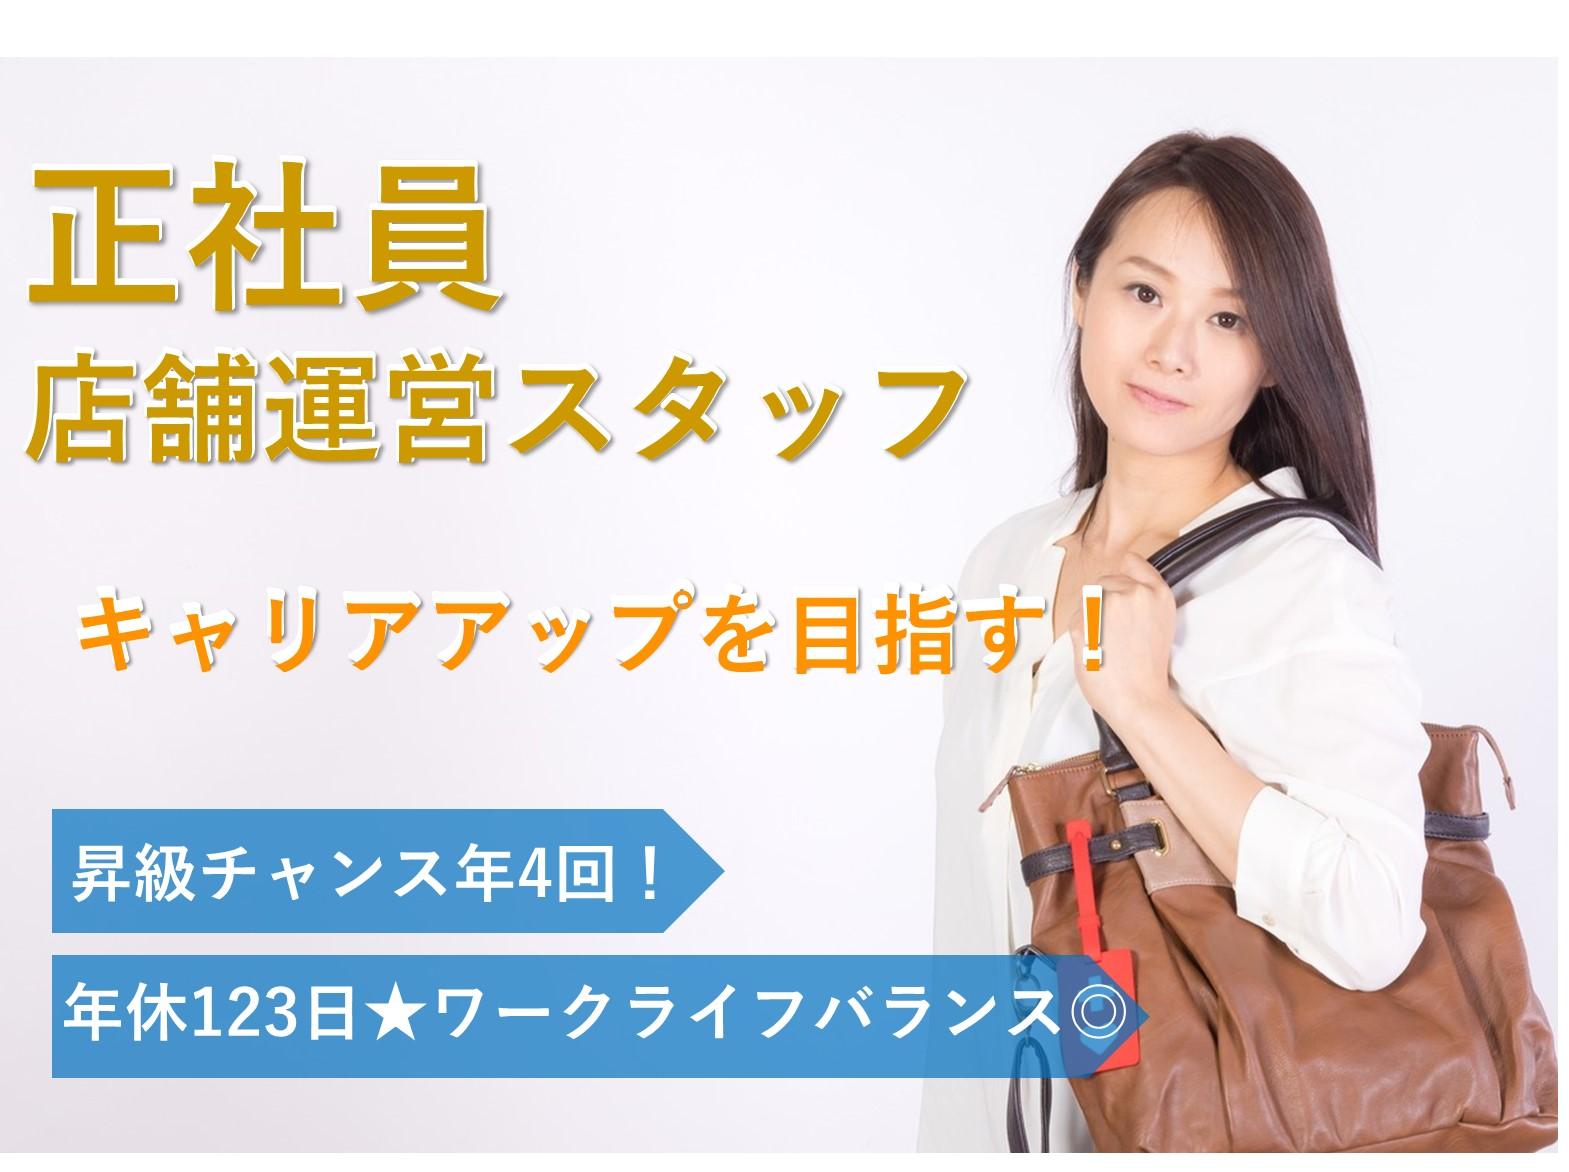 【即面談可能】昇進年4回!年休123日!【正社員】牛丼屋店舗運営スタッフ イメージ